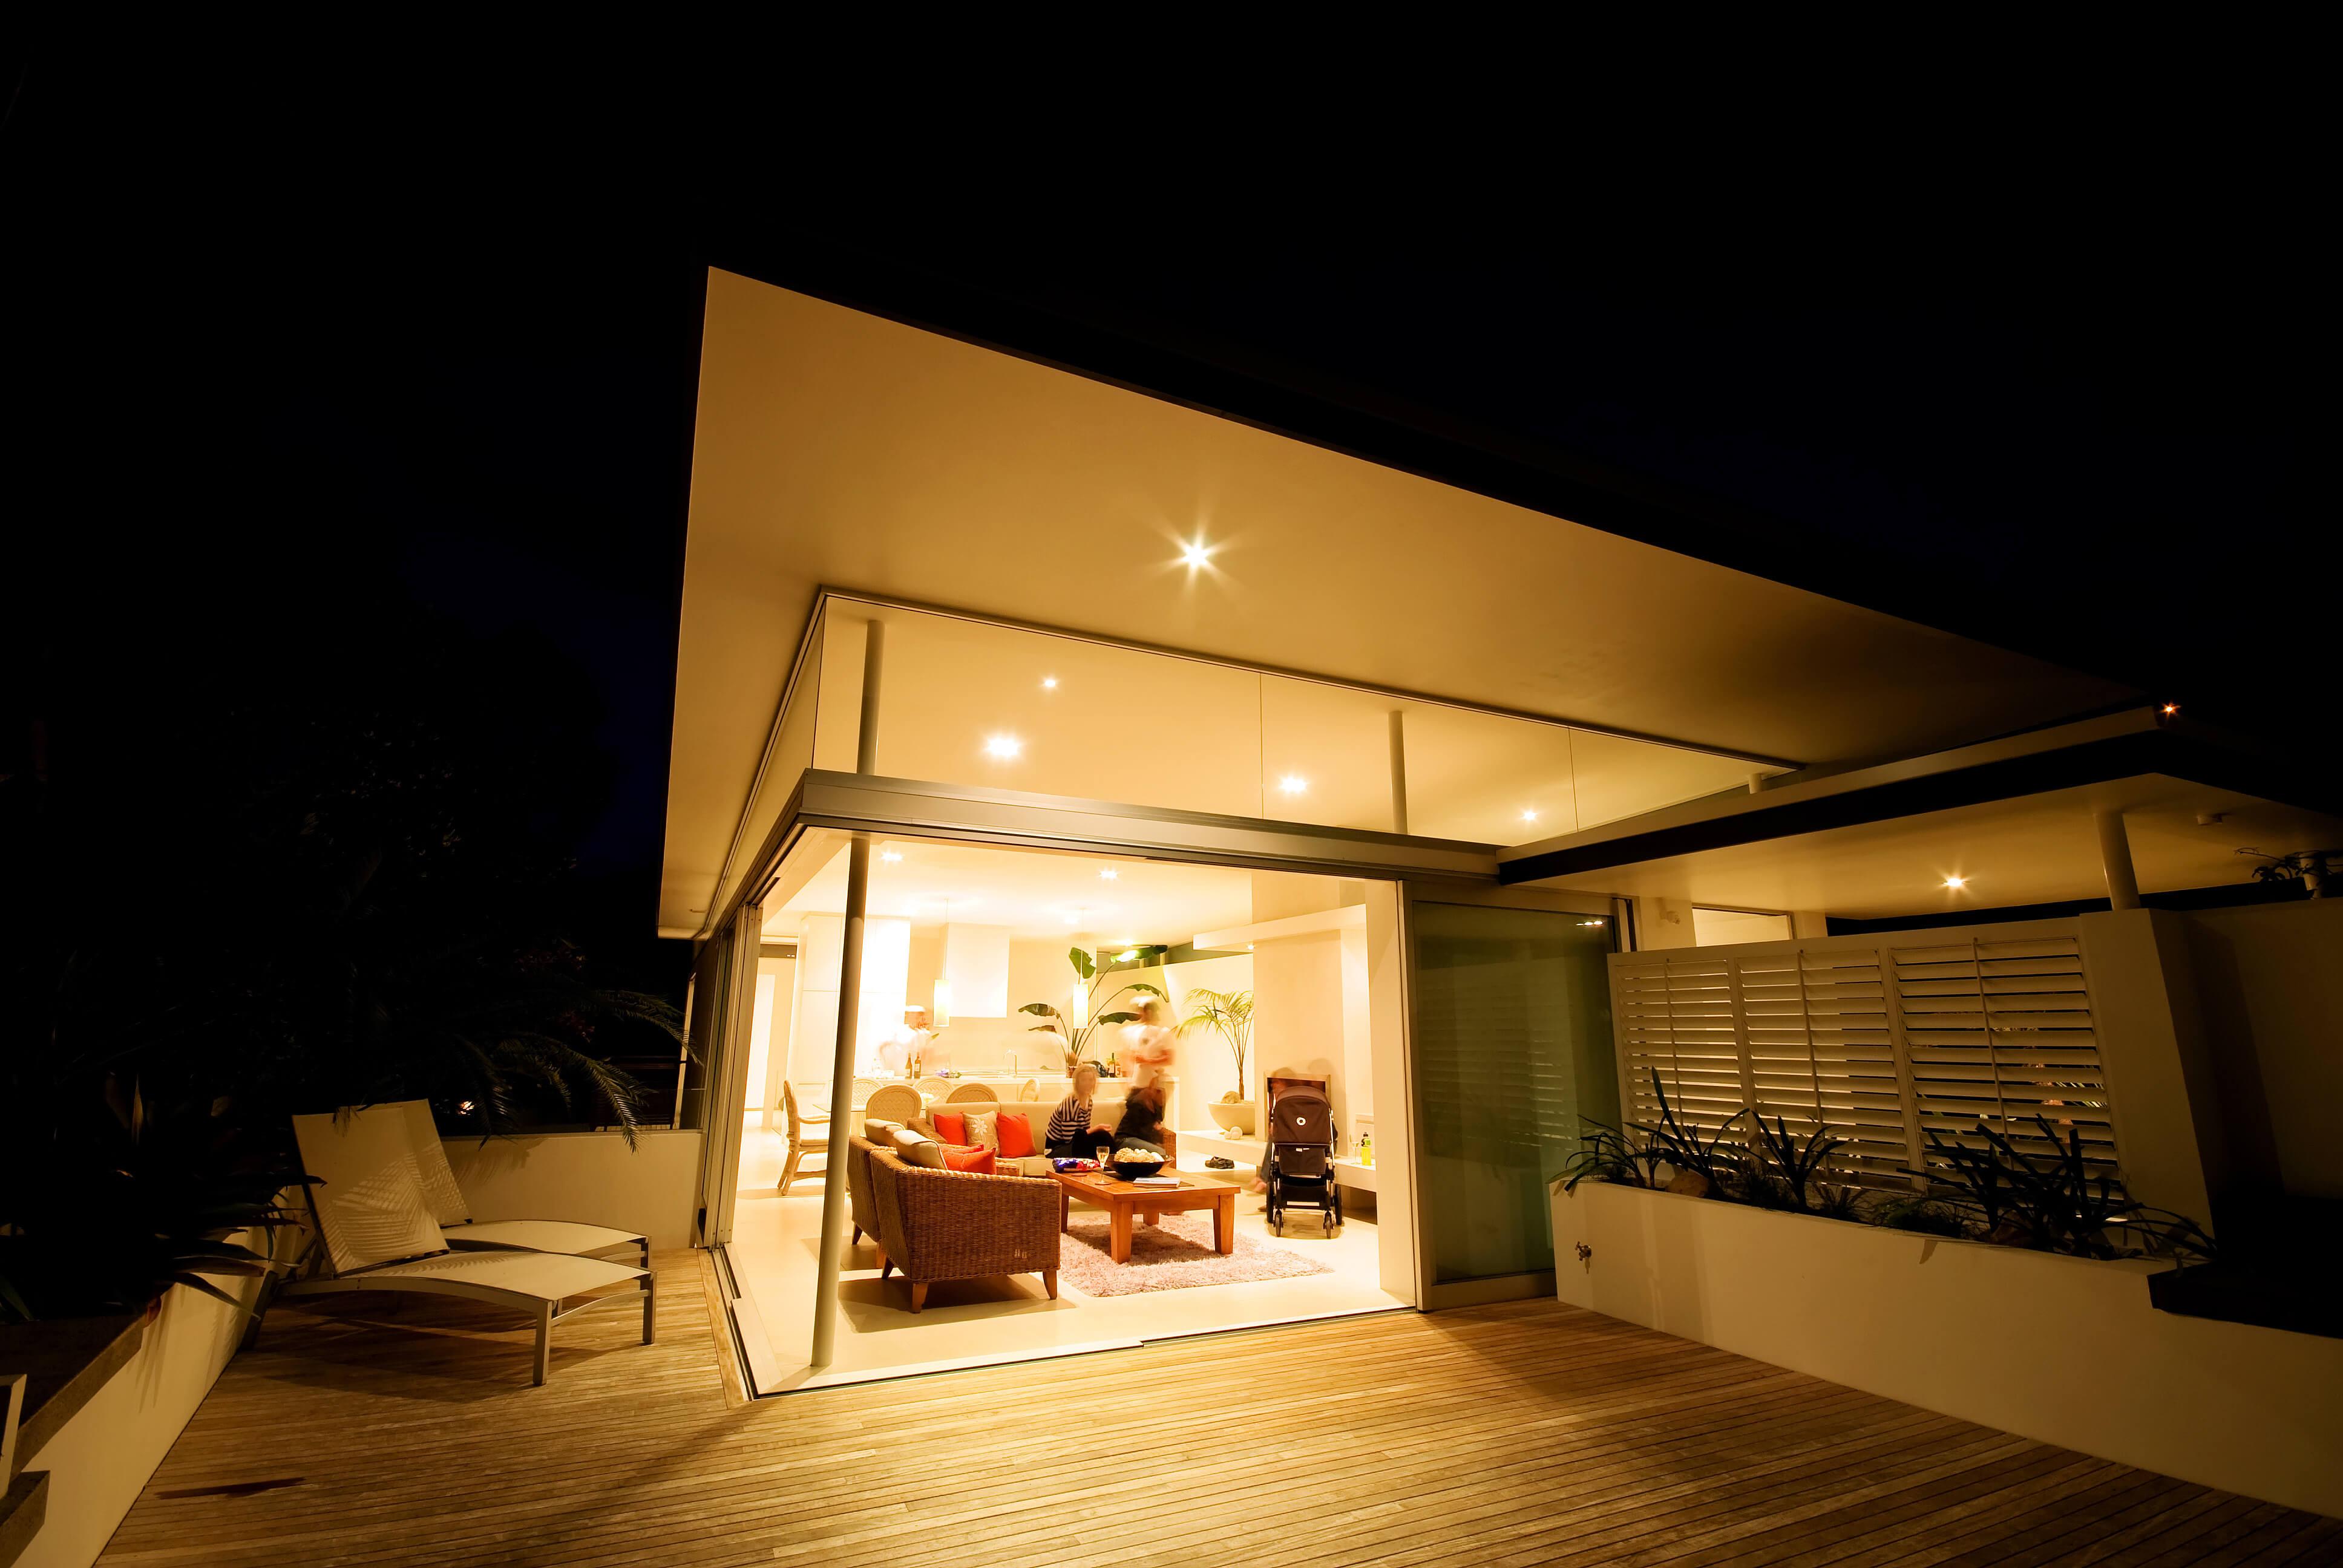 spot rt 2012 toute une gamme chez aerospot aerospot. Black Bedroom Furniture Sets. Home Design Ideas